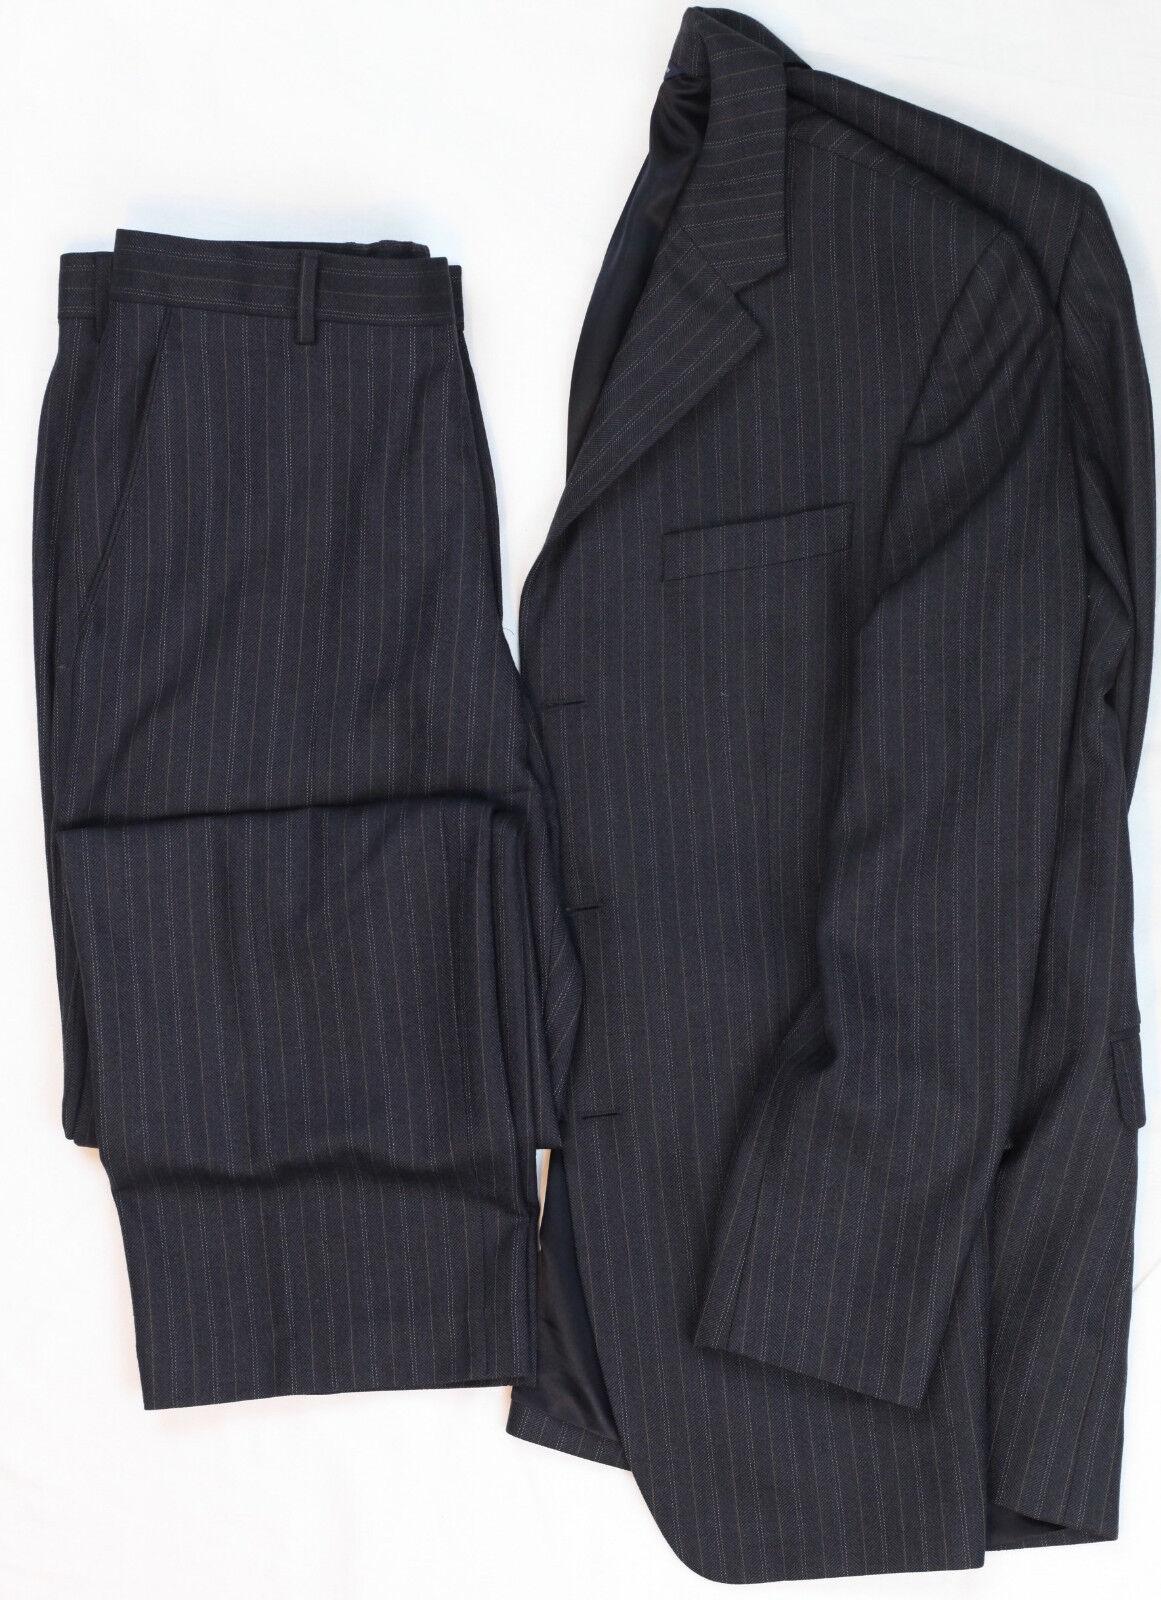 Banana Republic 3 Button Flat Front Pant Modern Fit Braun Striped Wool Suit 40R